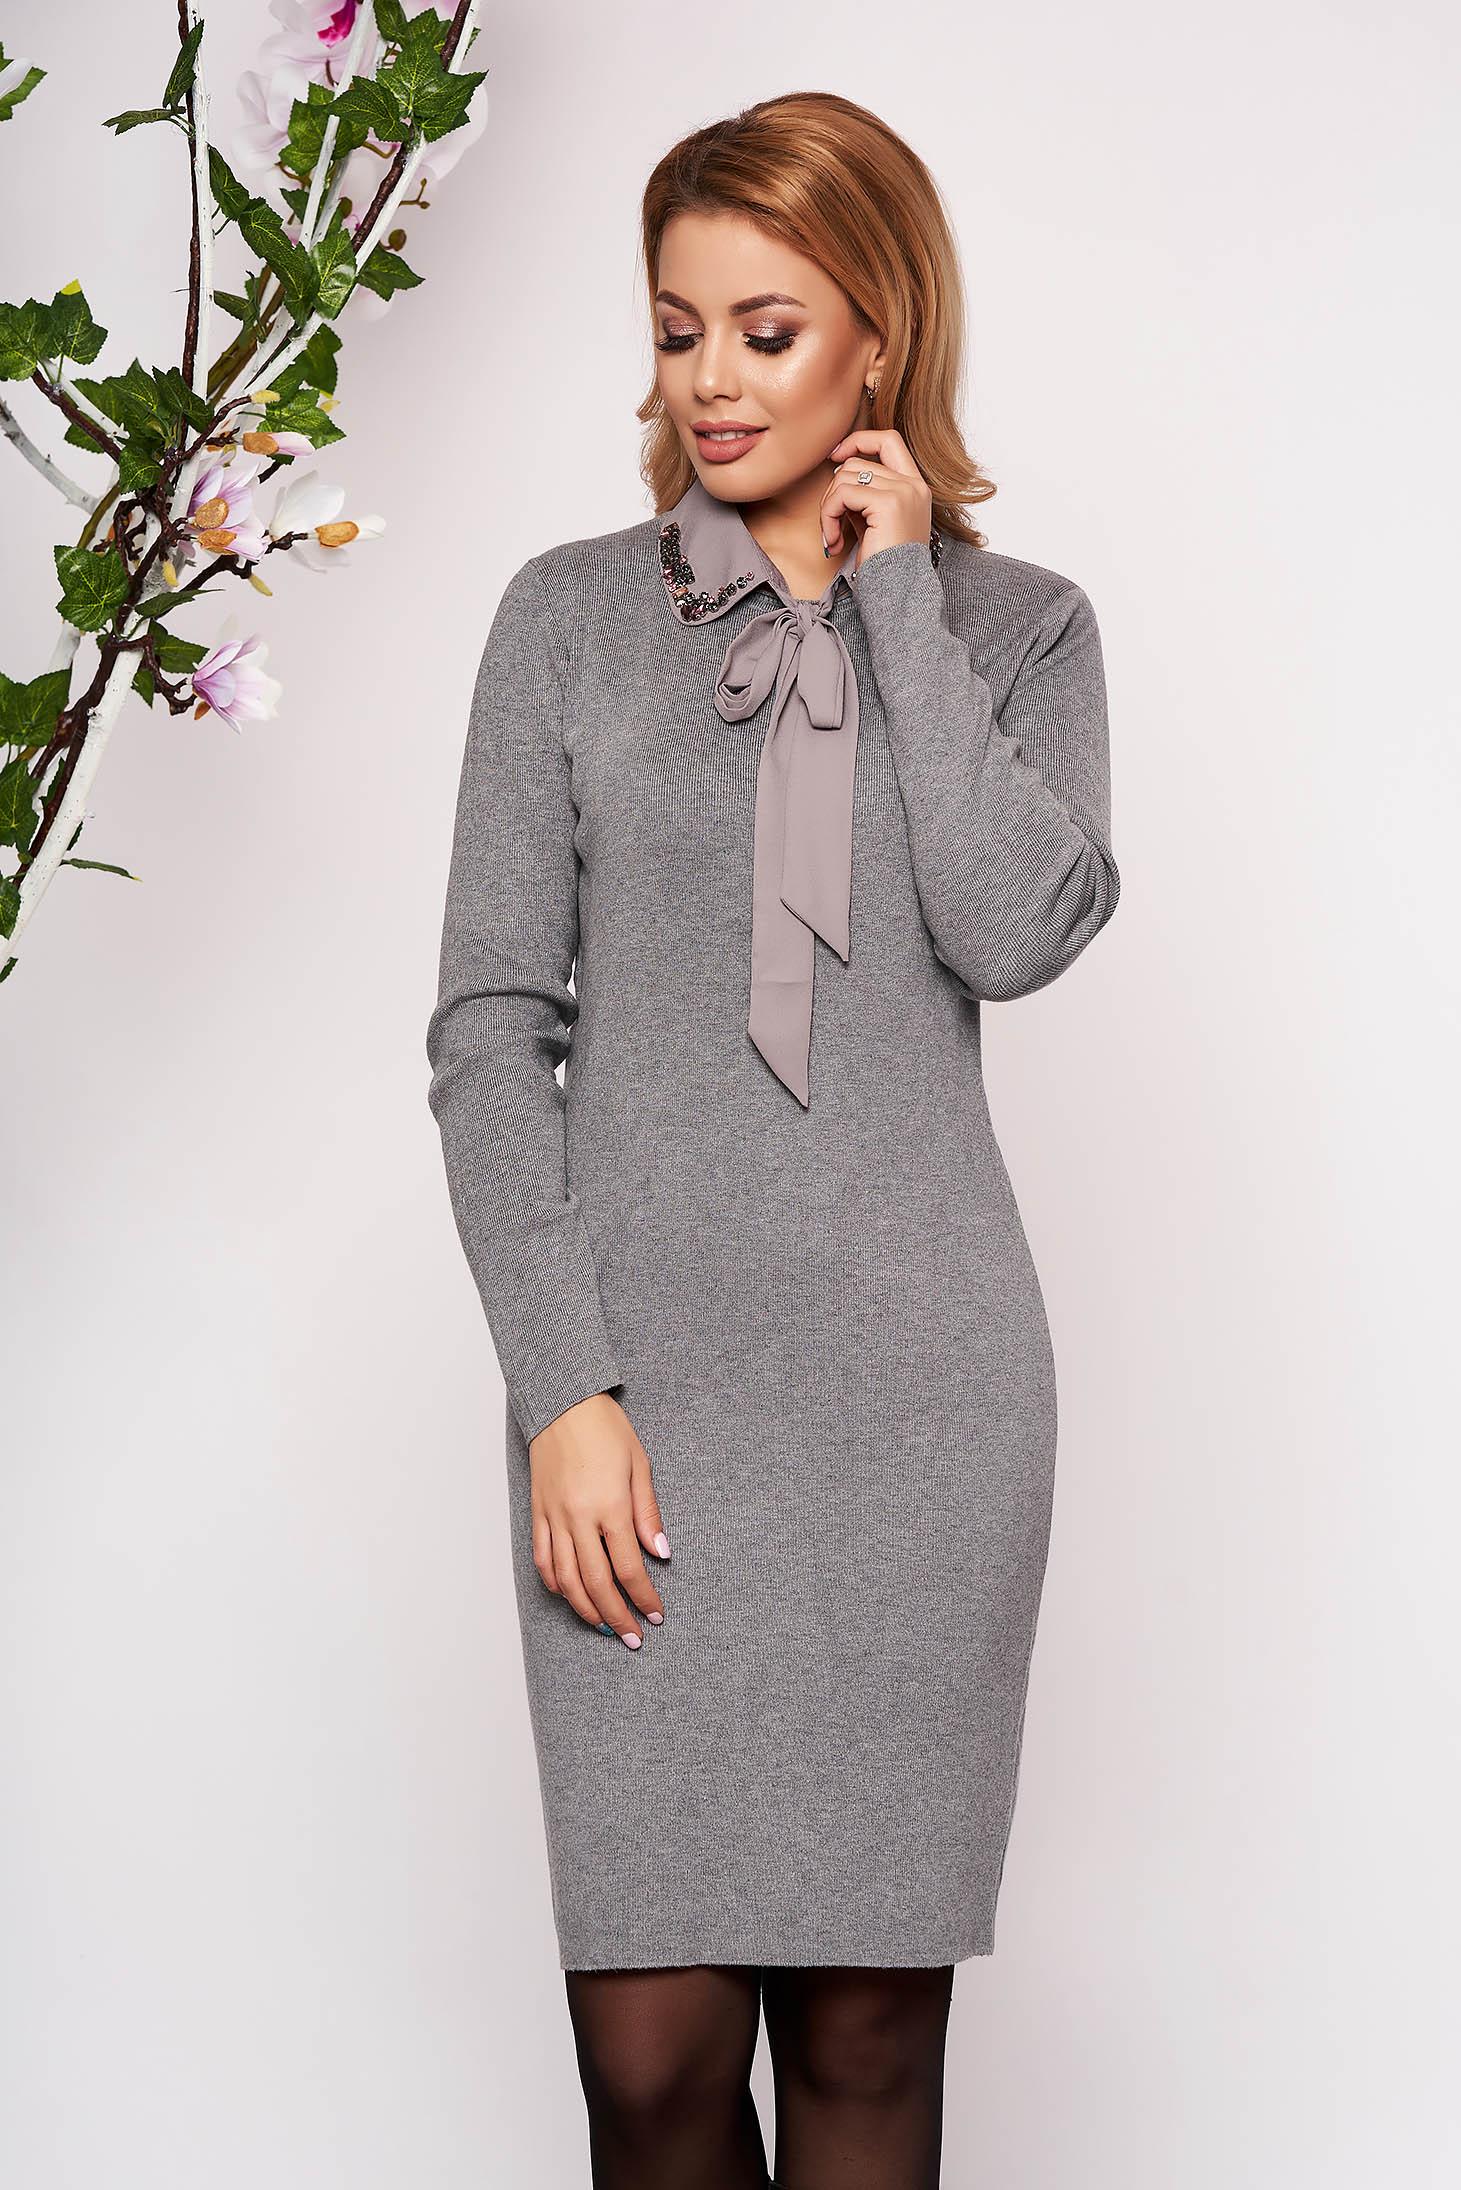 Grey dress elegant short cut knitted pencil detachable collar long sleeved neckline